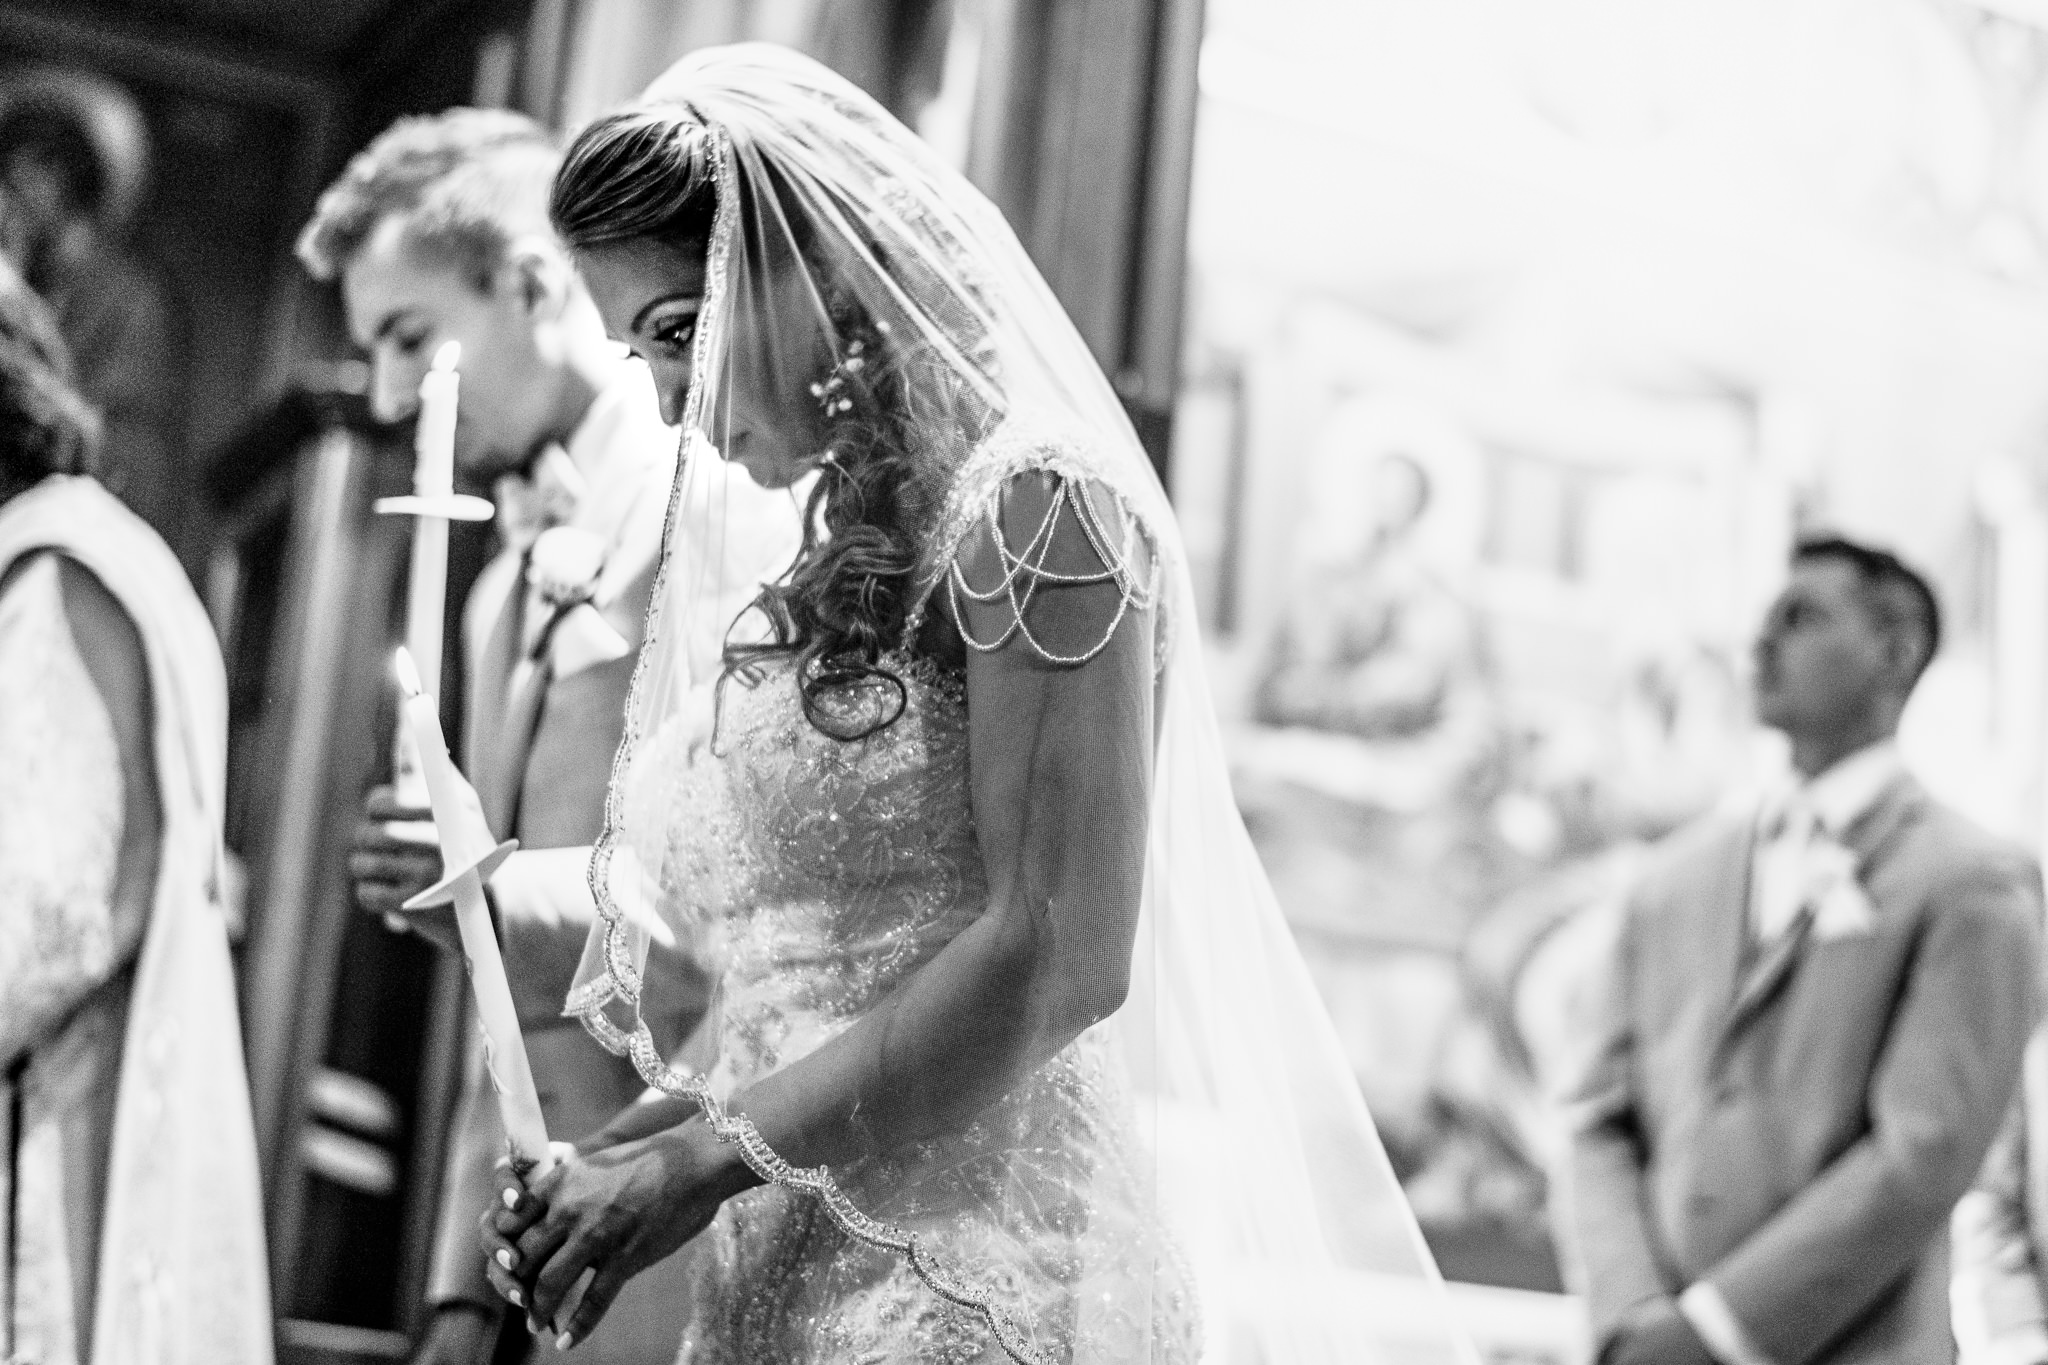 Barbato-Moorestown-Community-House-Wedding-New-Jersey-Photographer-08.JPG